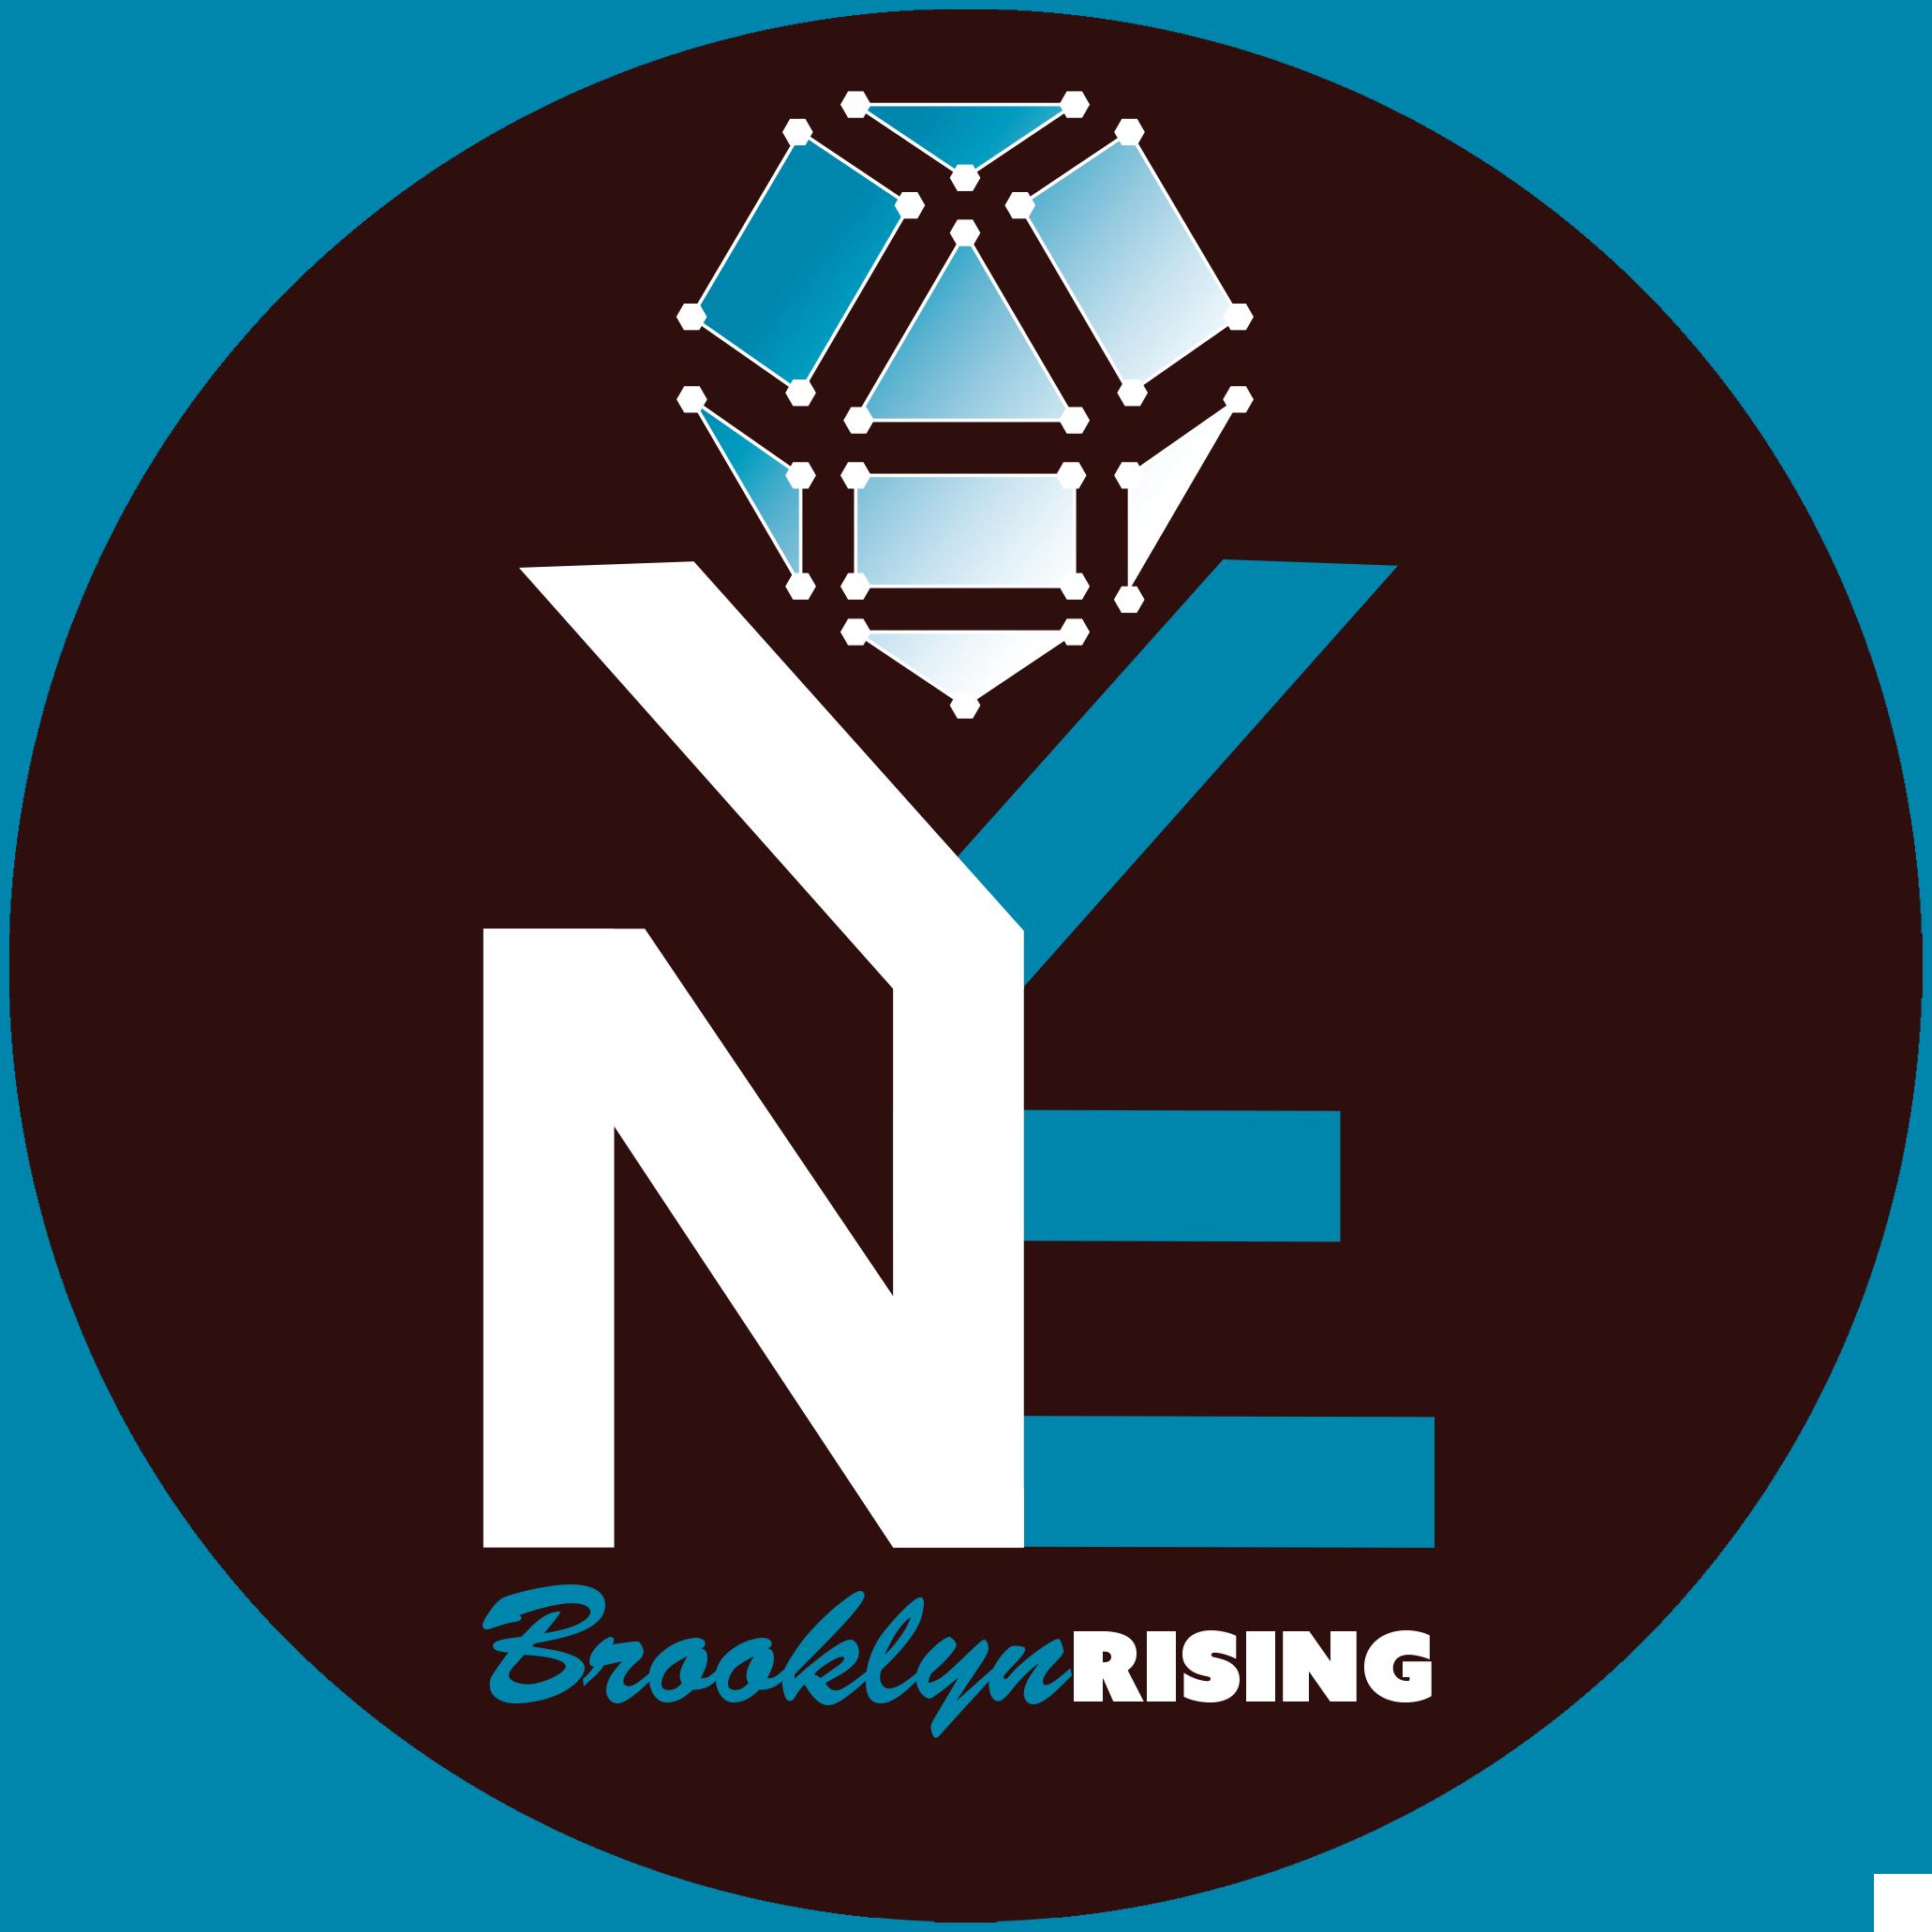 Brooklyn Rising Social Media Logo